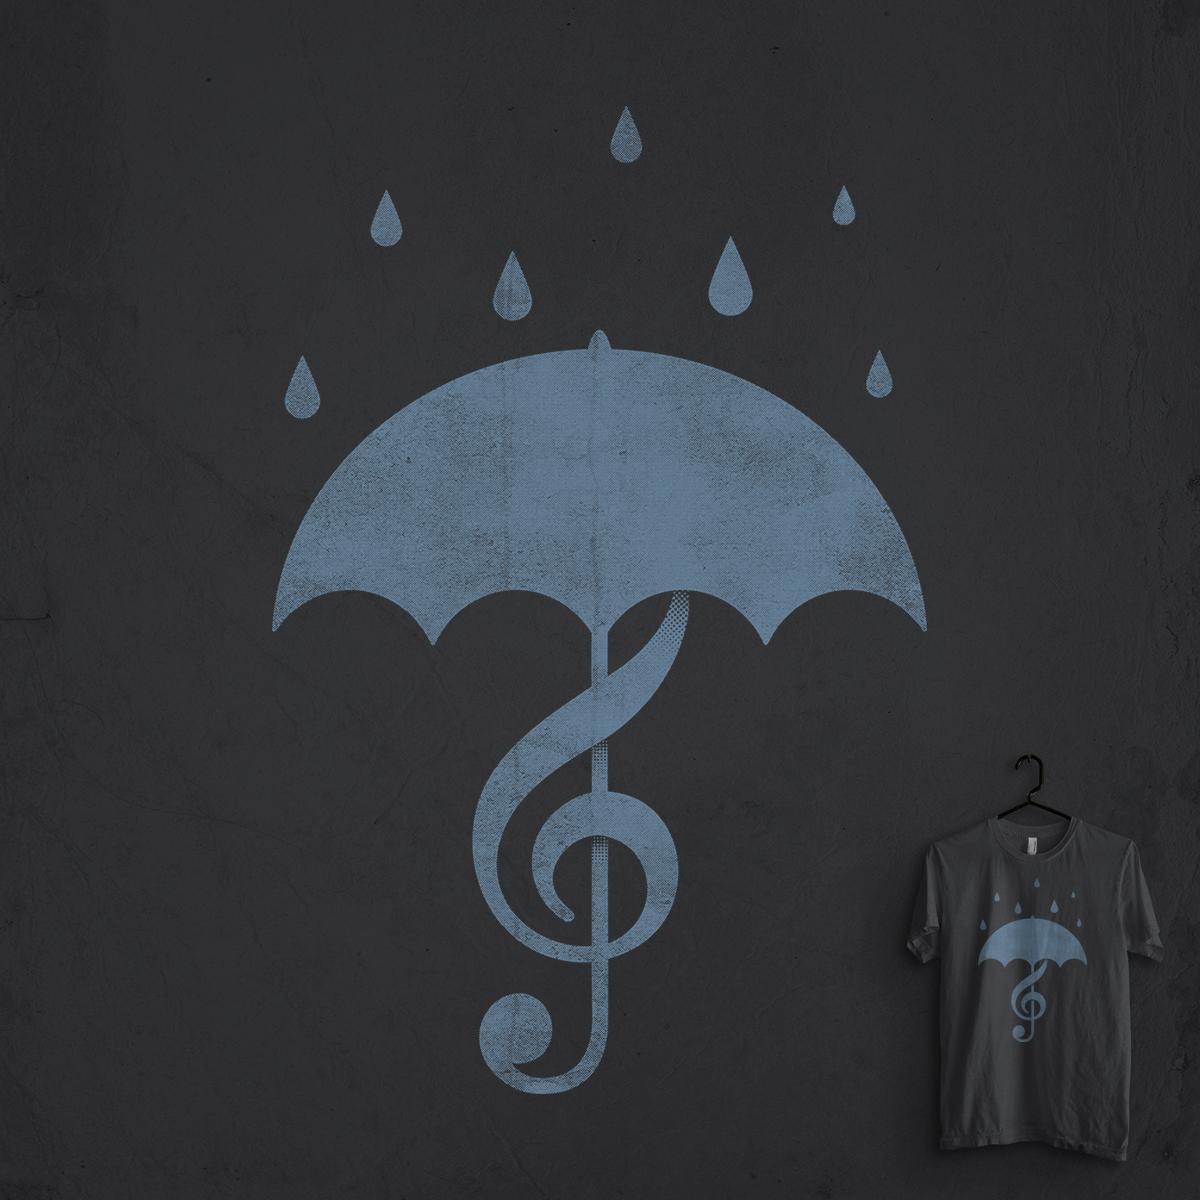 Singing in the Rain by idilek on Threadless